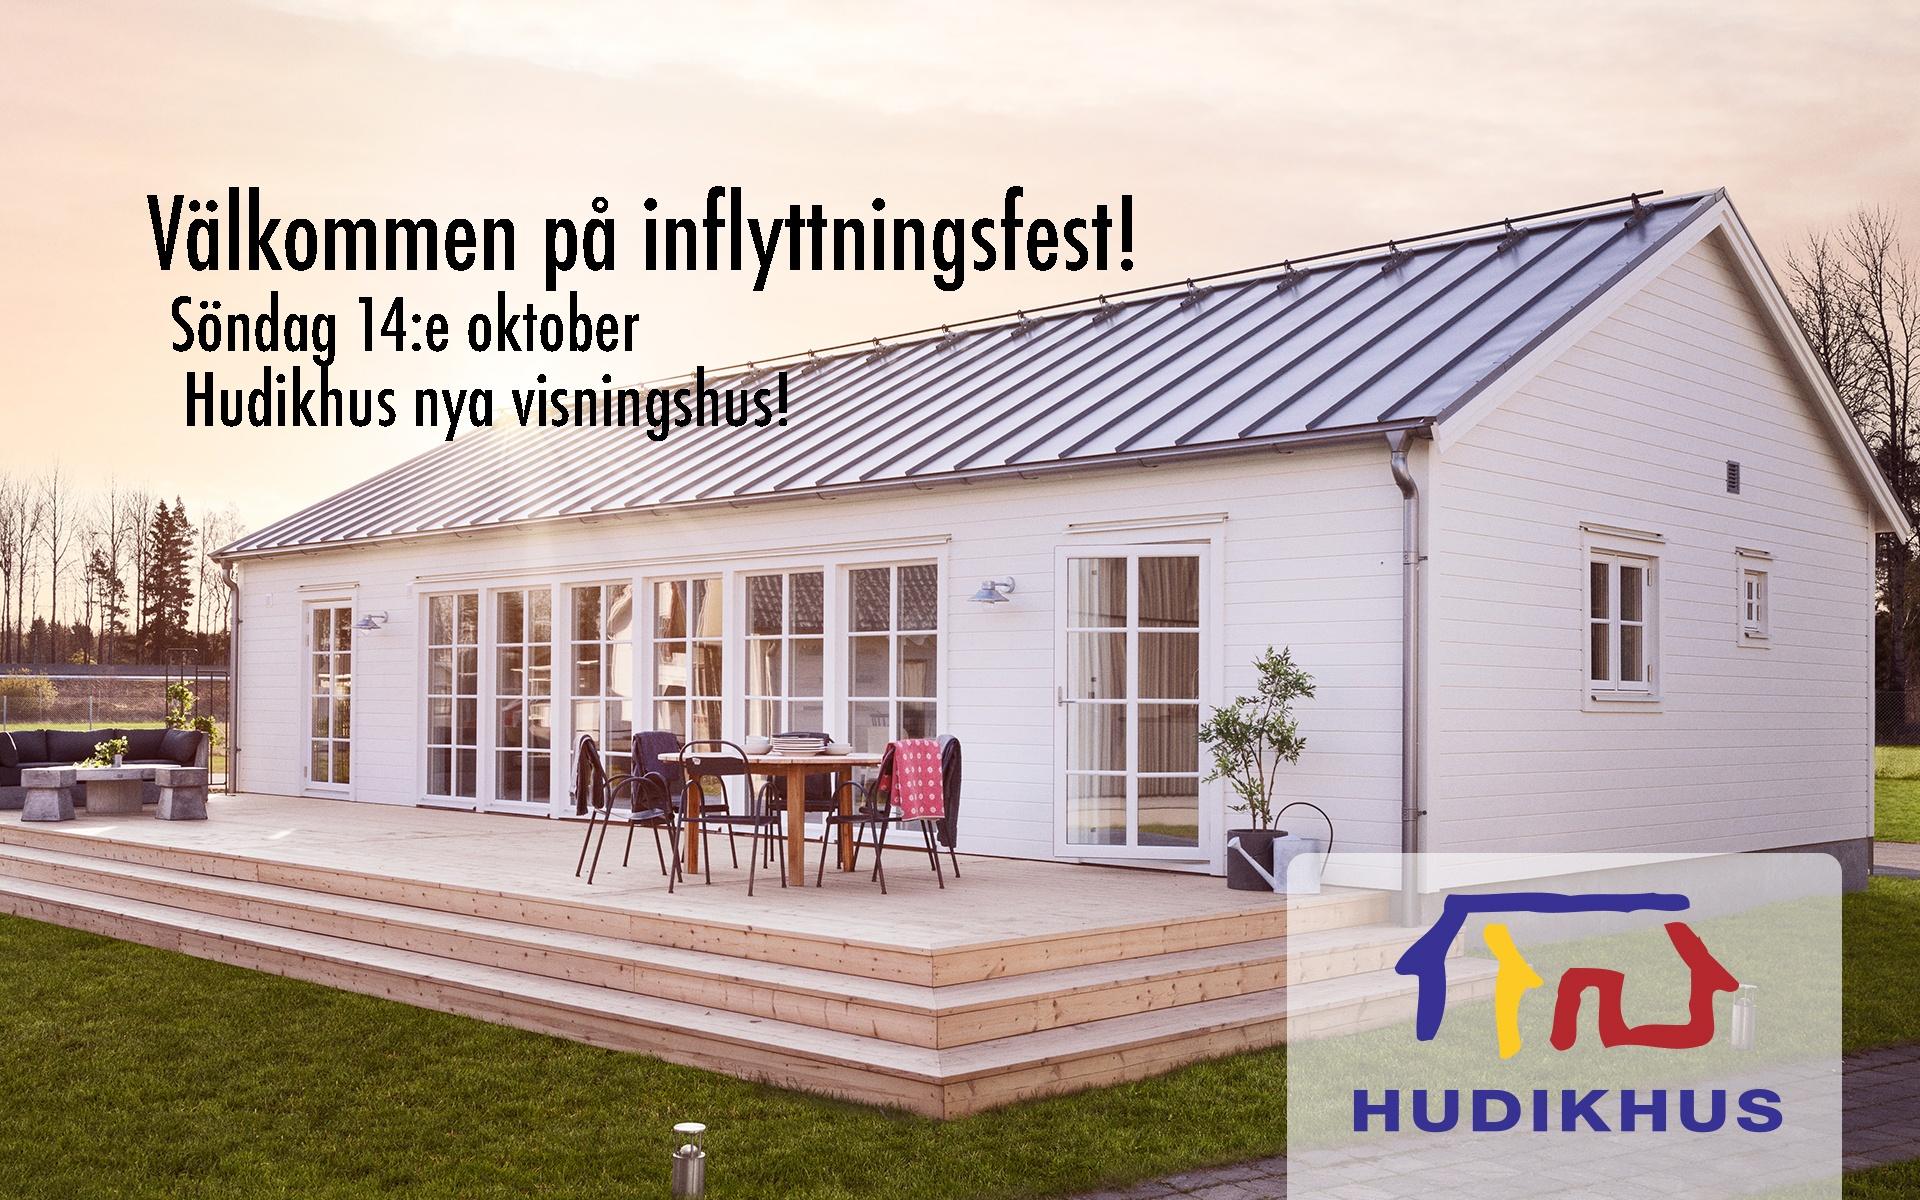 InflyttningsfestHudikhus